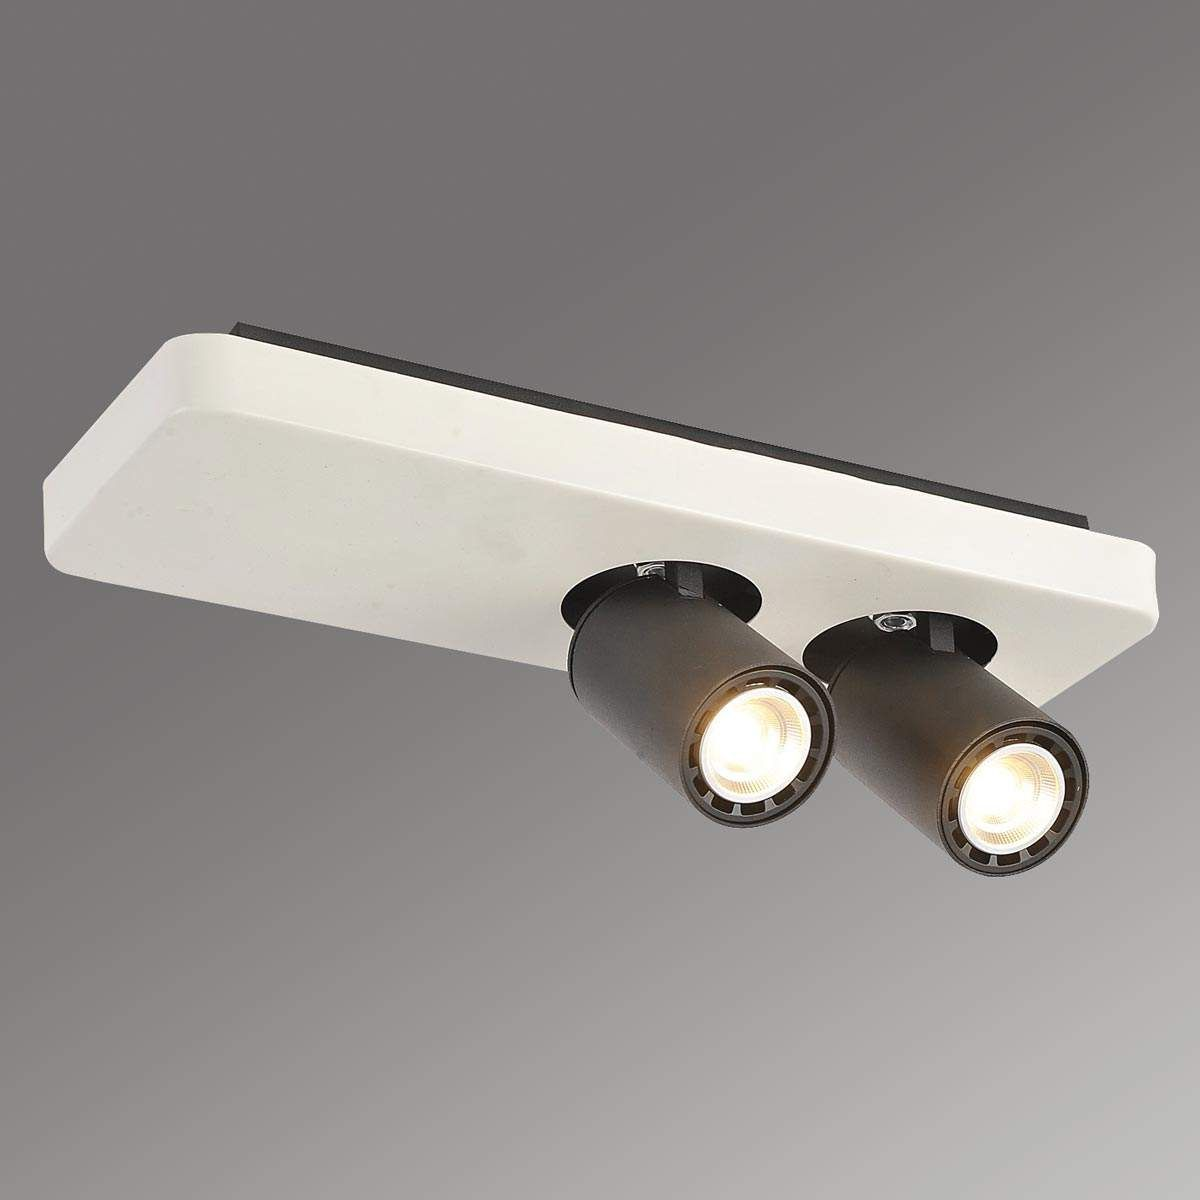 Spot Birne Wechseln Deckenlampe Led Strahler Led Strahler